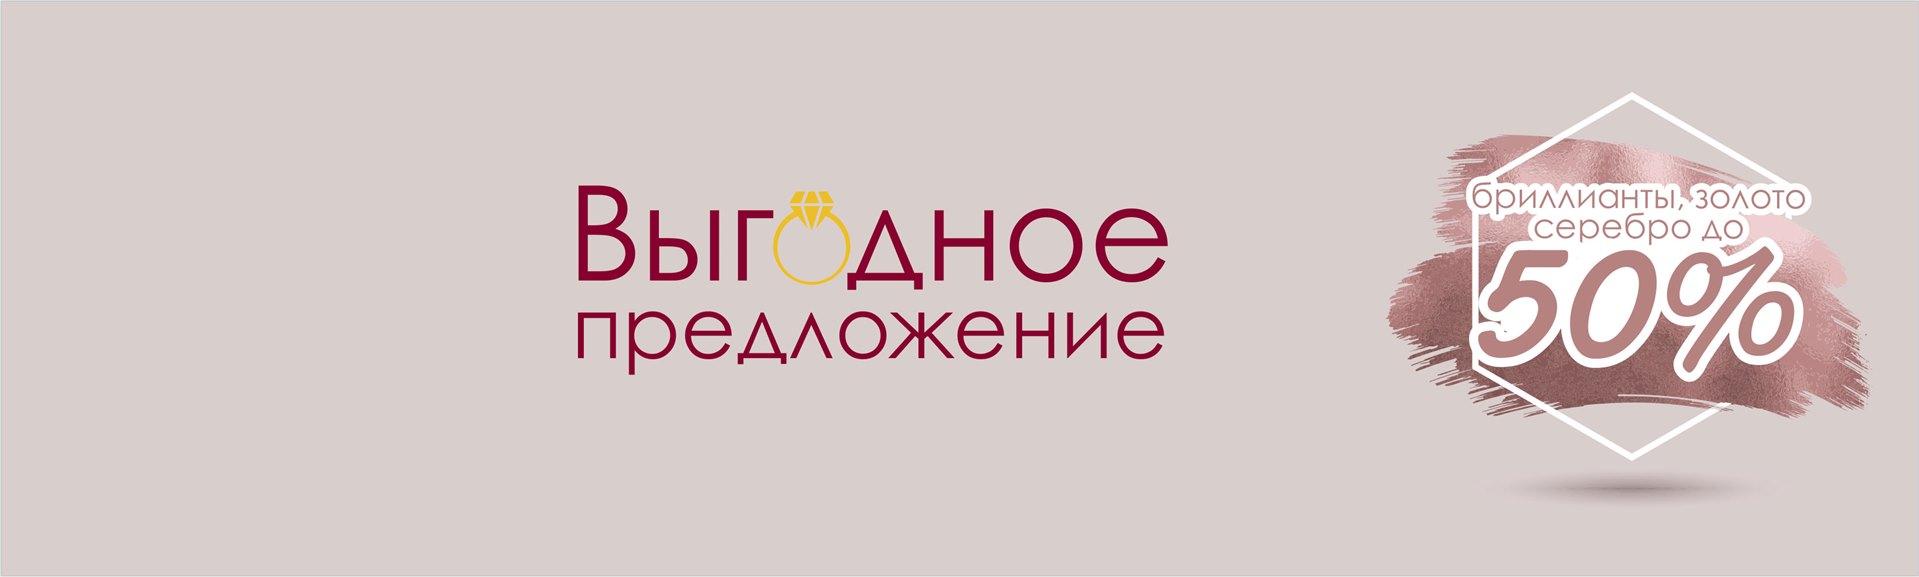 https://www.almazcom.ru/pub/img/QA/actions/Banner_aktsiya_sajt.jpg